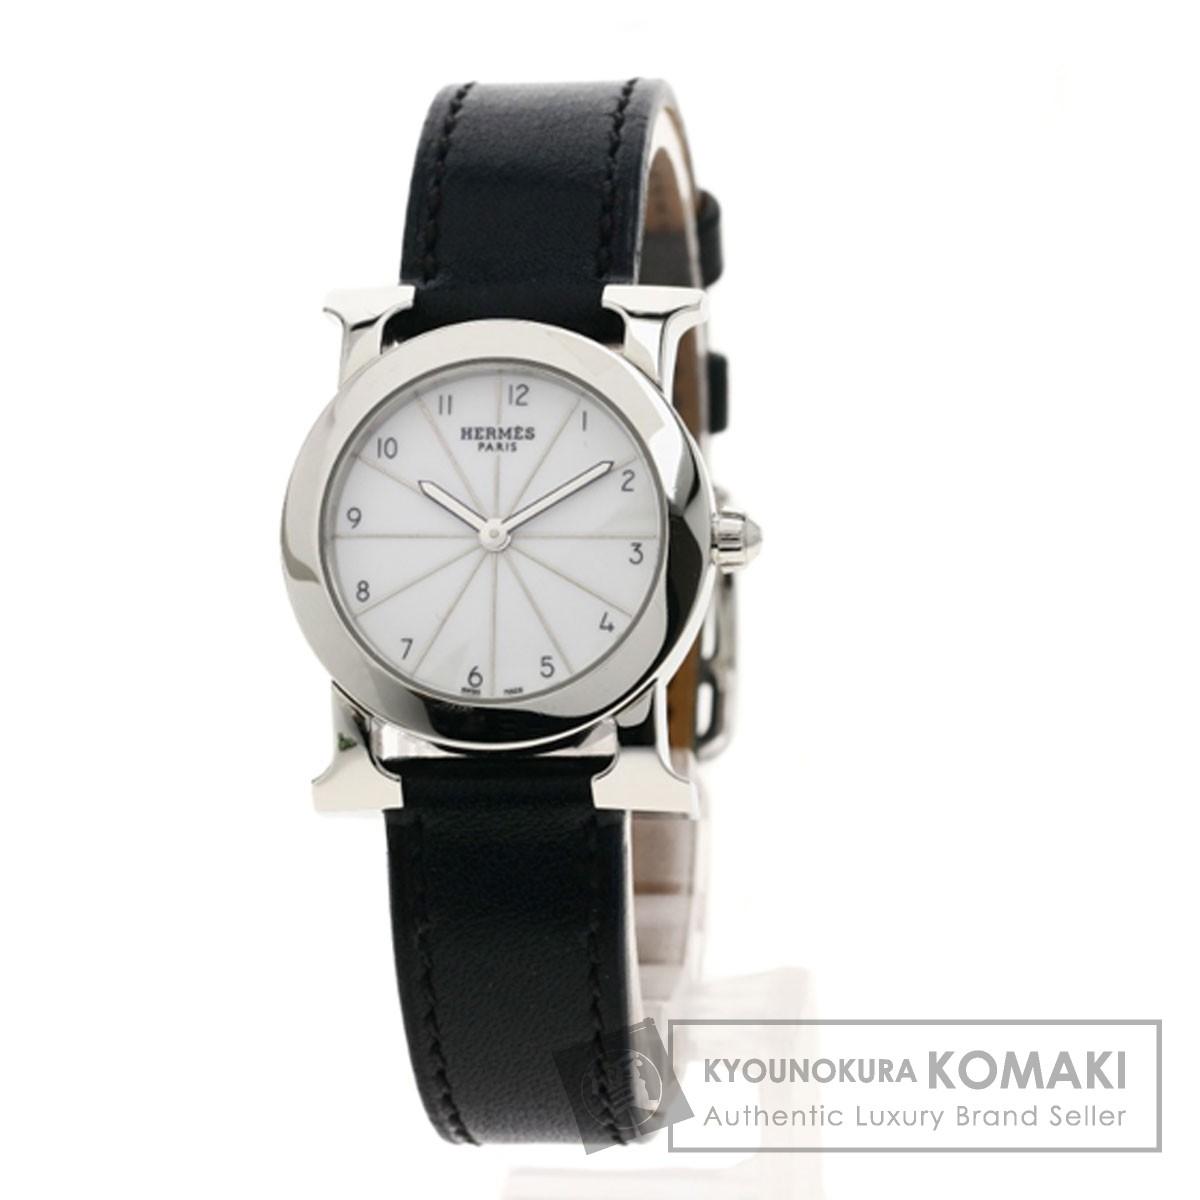 HERMES HR1.210 ロンド 腕時計 SS/革 レディース 【中古】【エルメス】